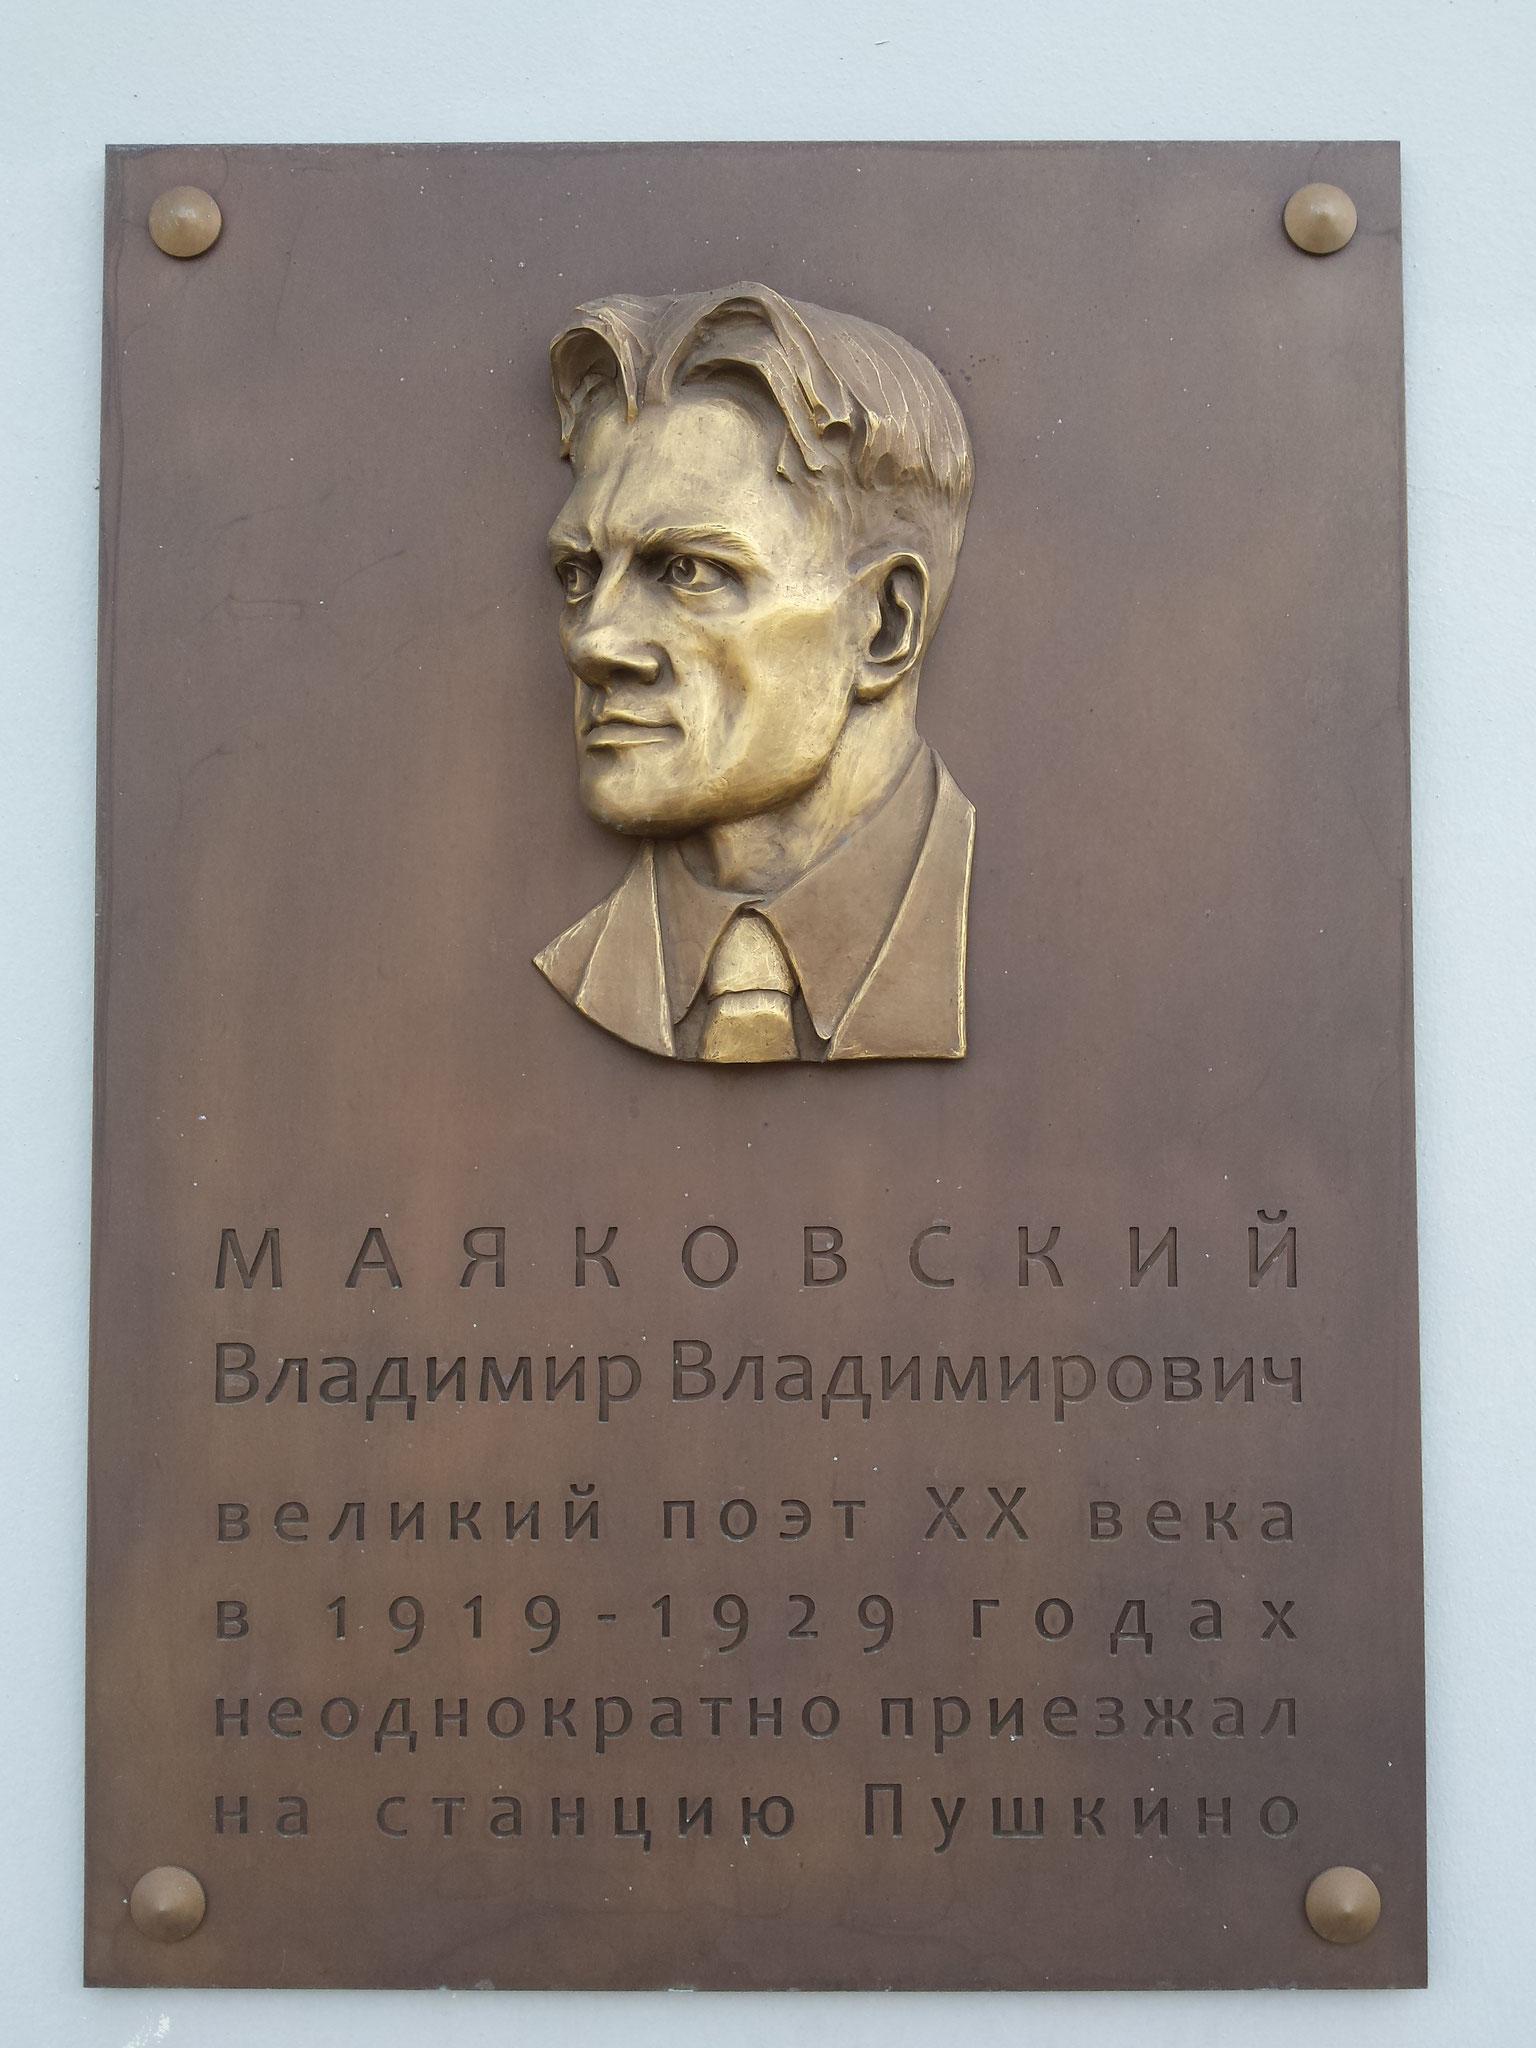 Памятная доска В.Маяковскому. 2011. бронза. 75х50см